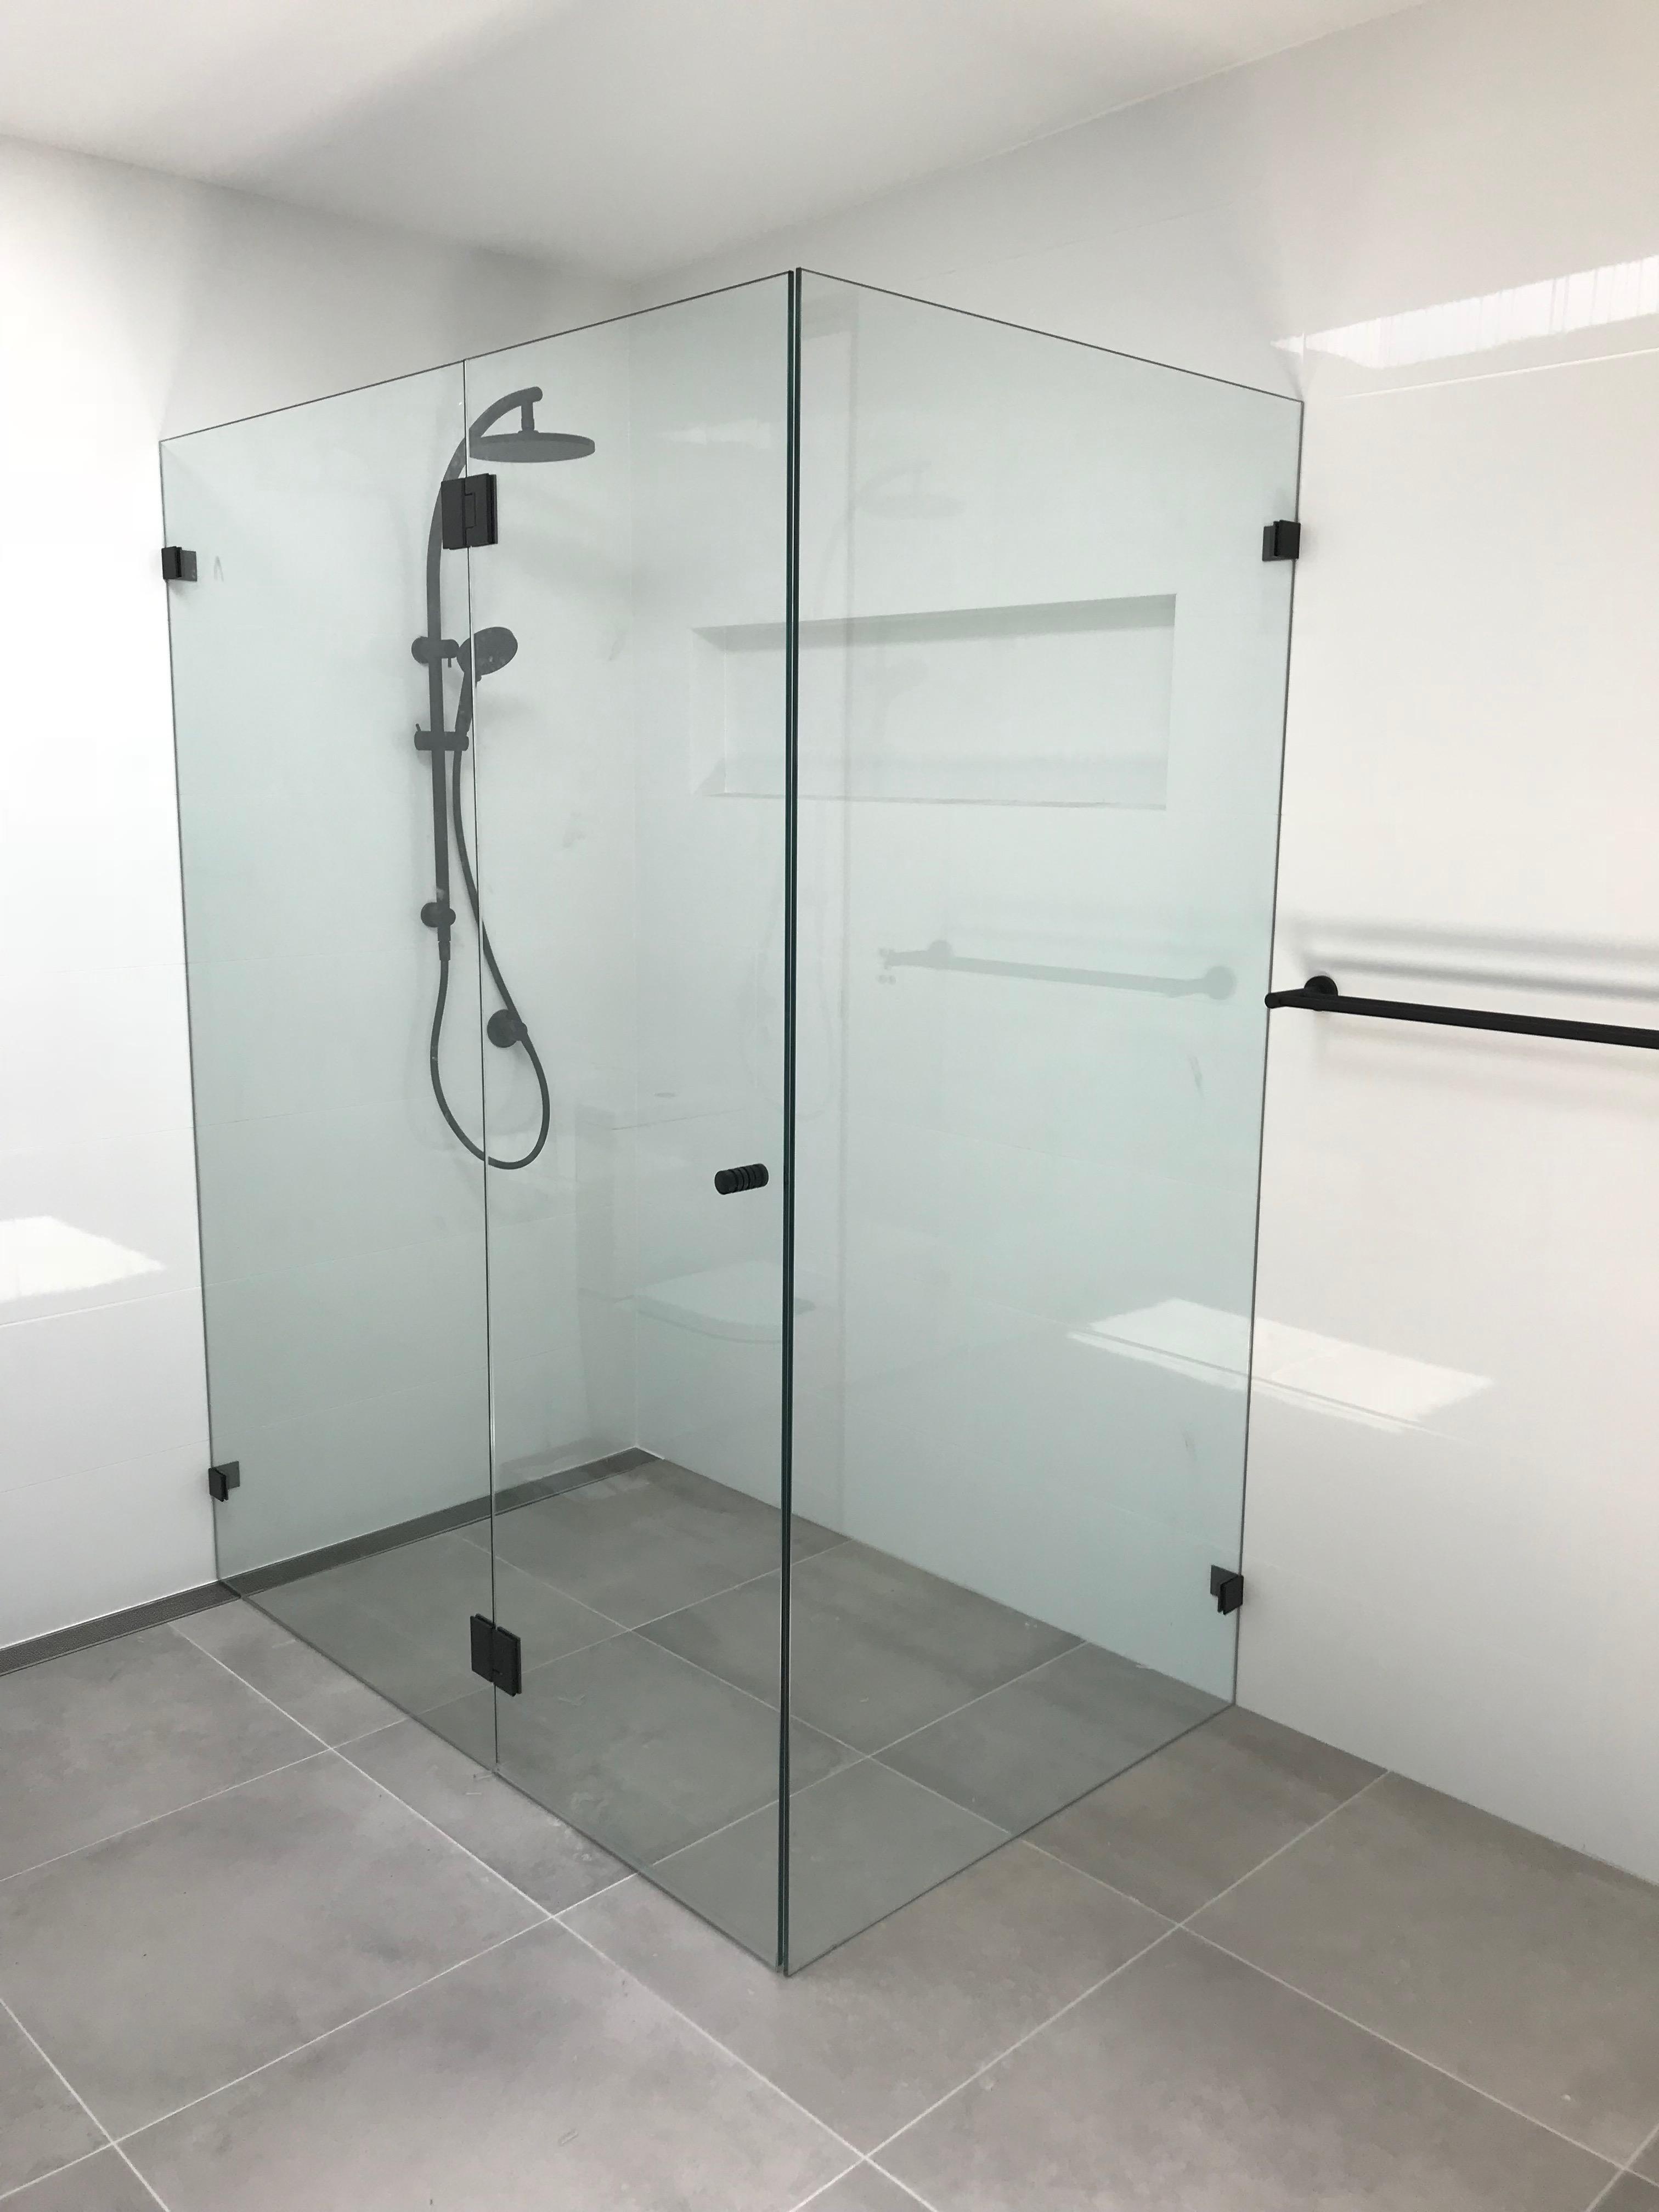 Frameless Shower Screens Built In Wardrobes Sydney And Shower Screens